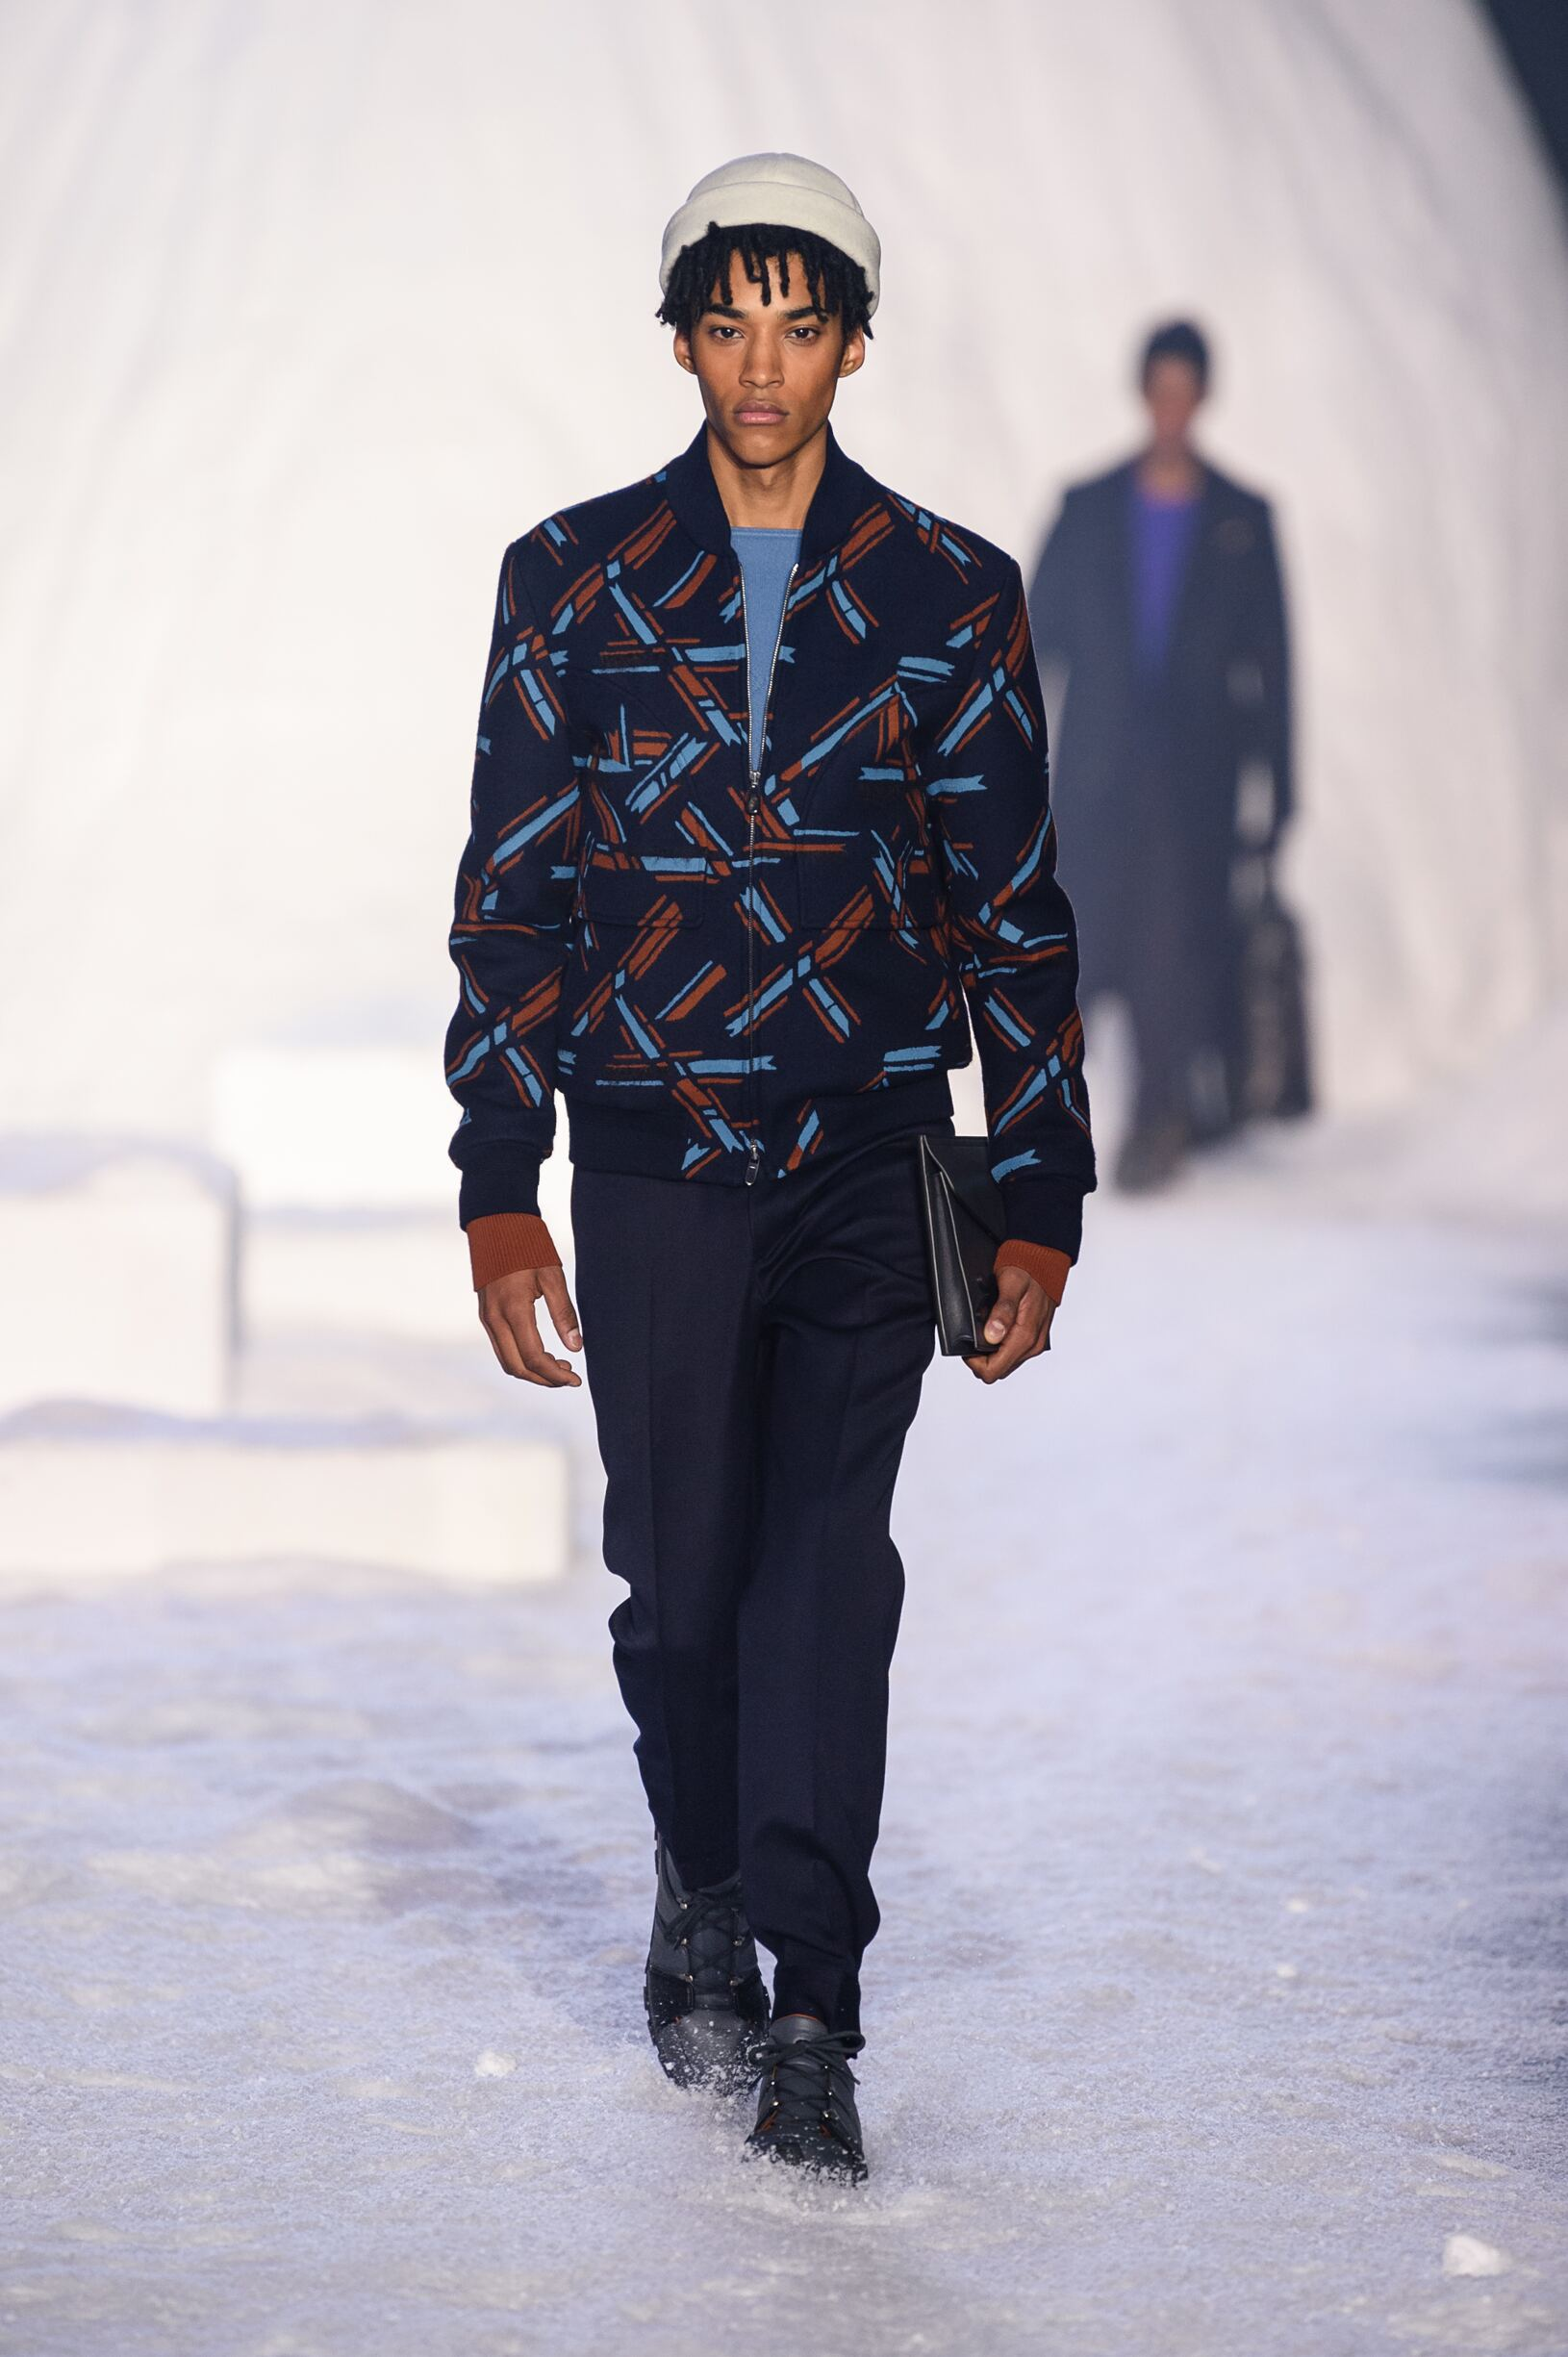 Catwalk Ermenegildo Zegna Couture Man Fashion Show Winter 2018